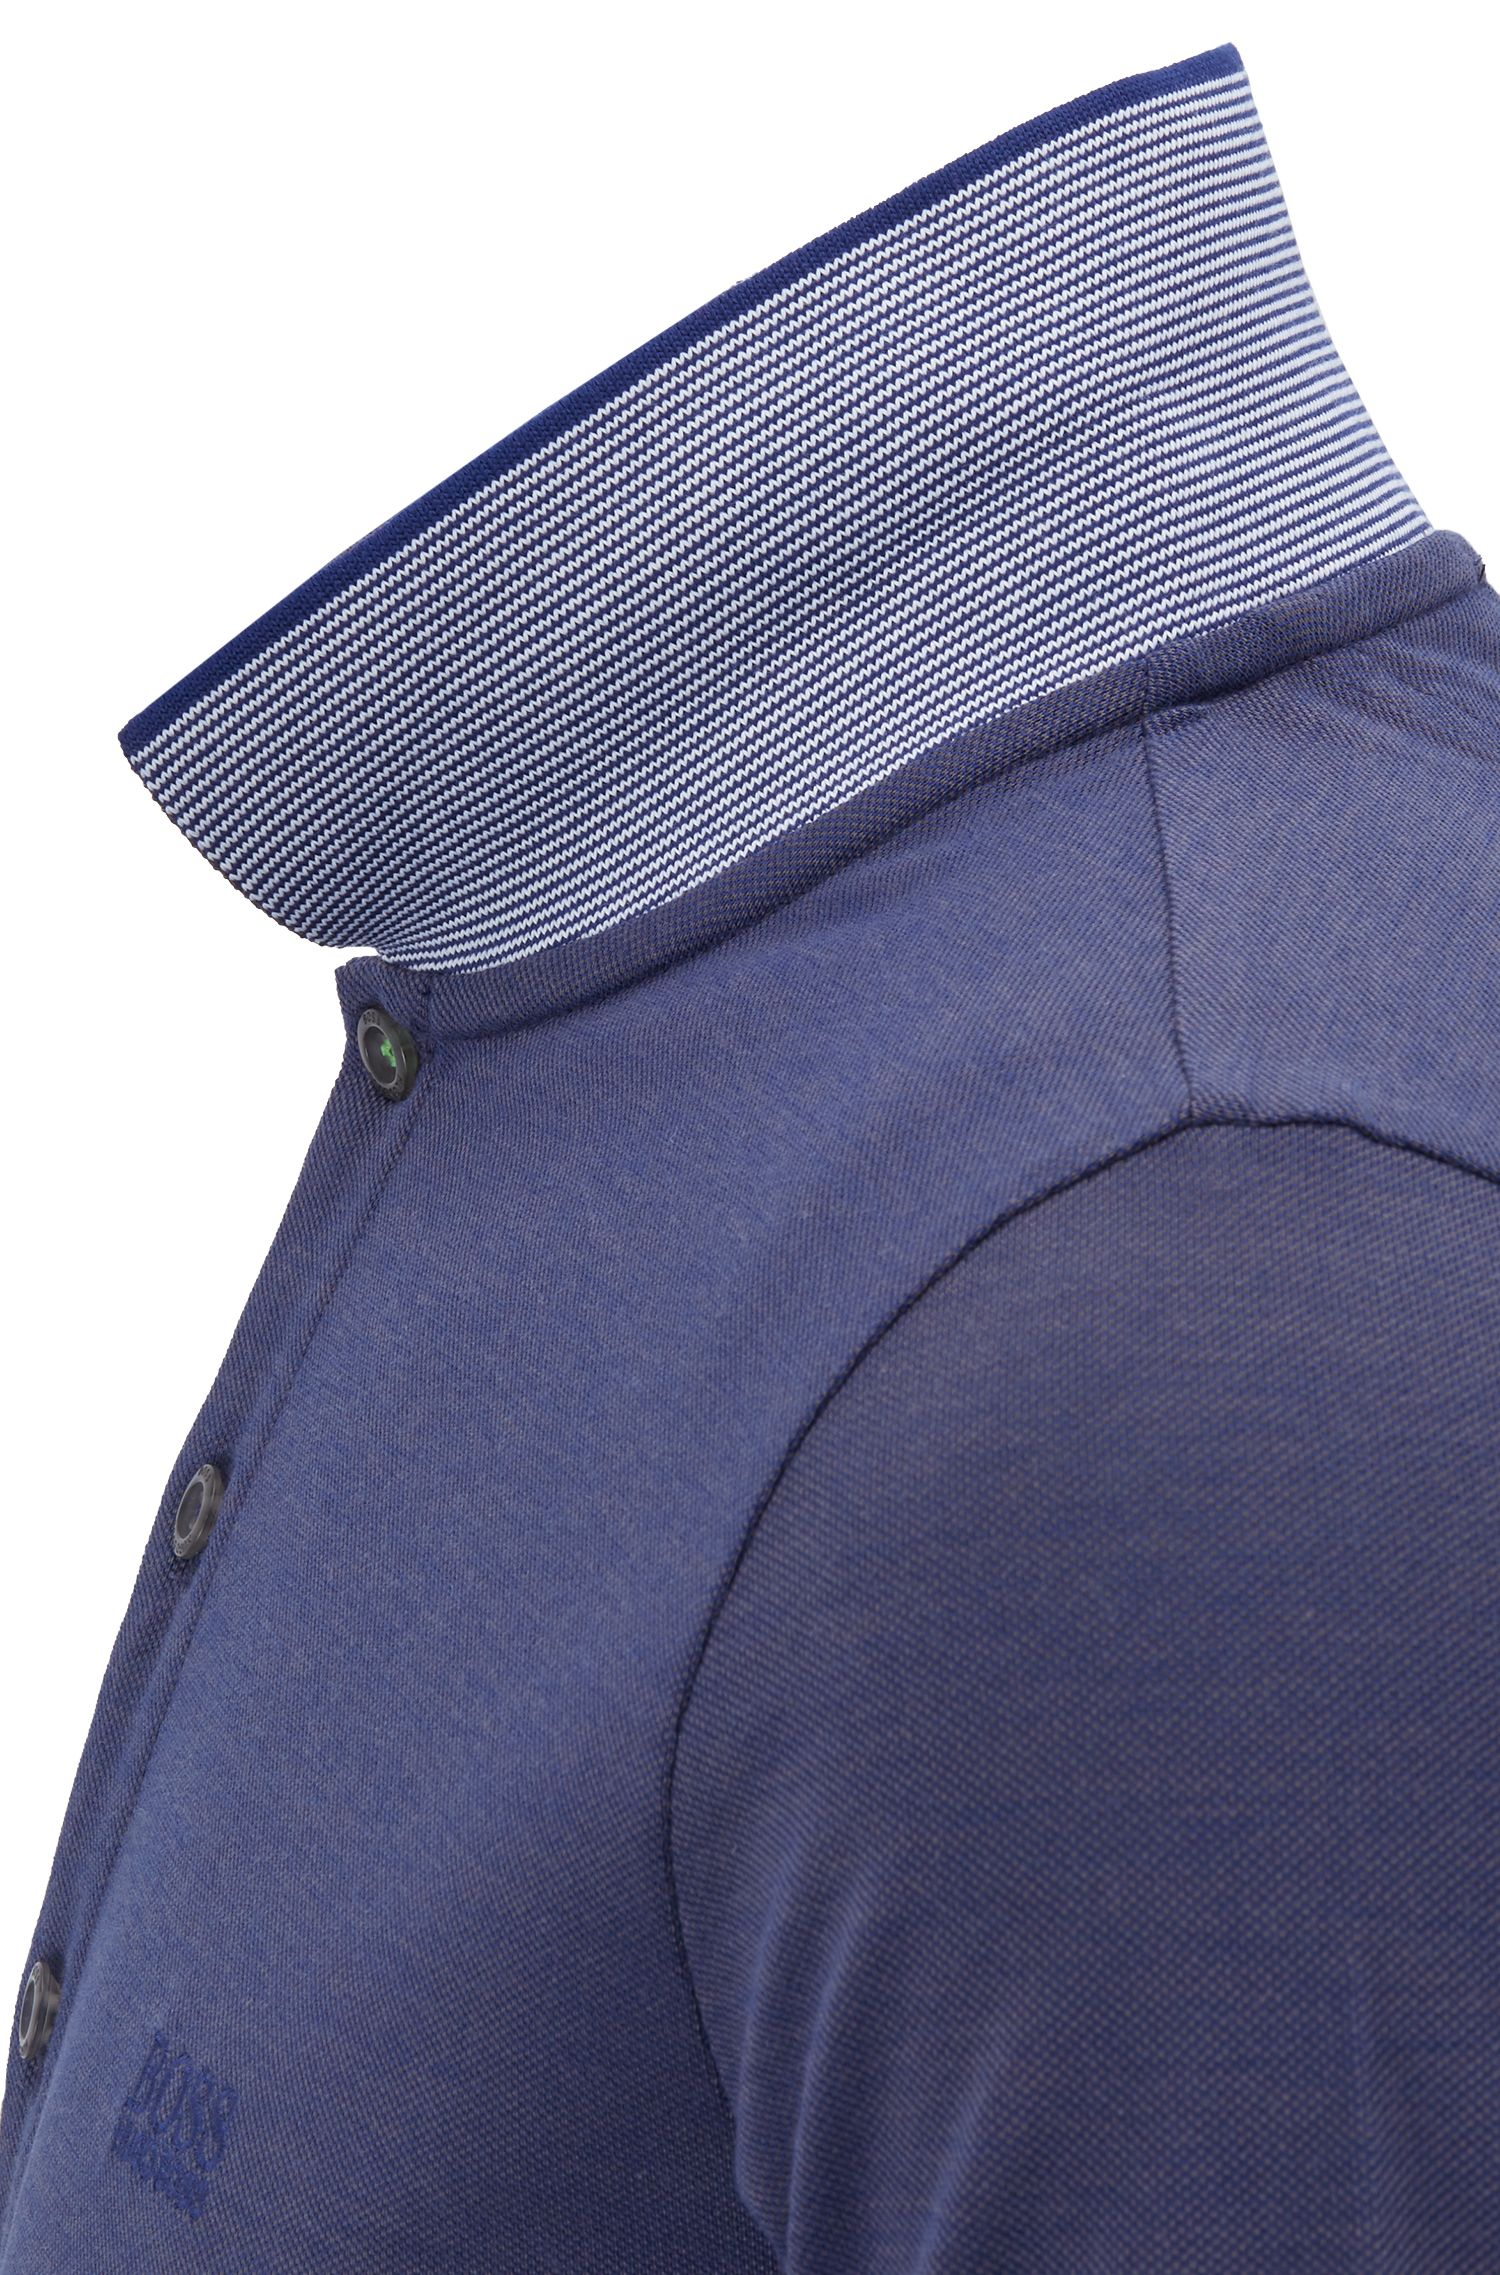 Slim-fit logo polo shirt in cotton piqué, Dark Grey